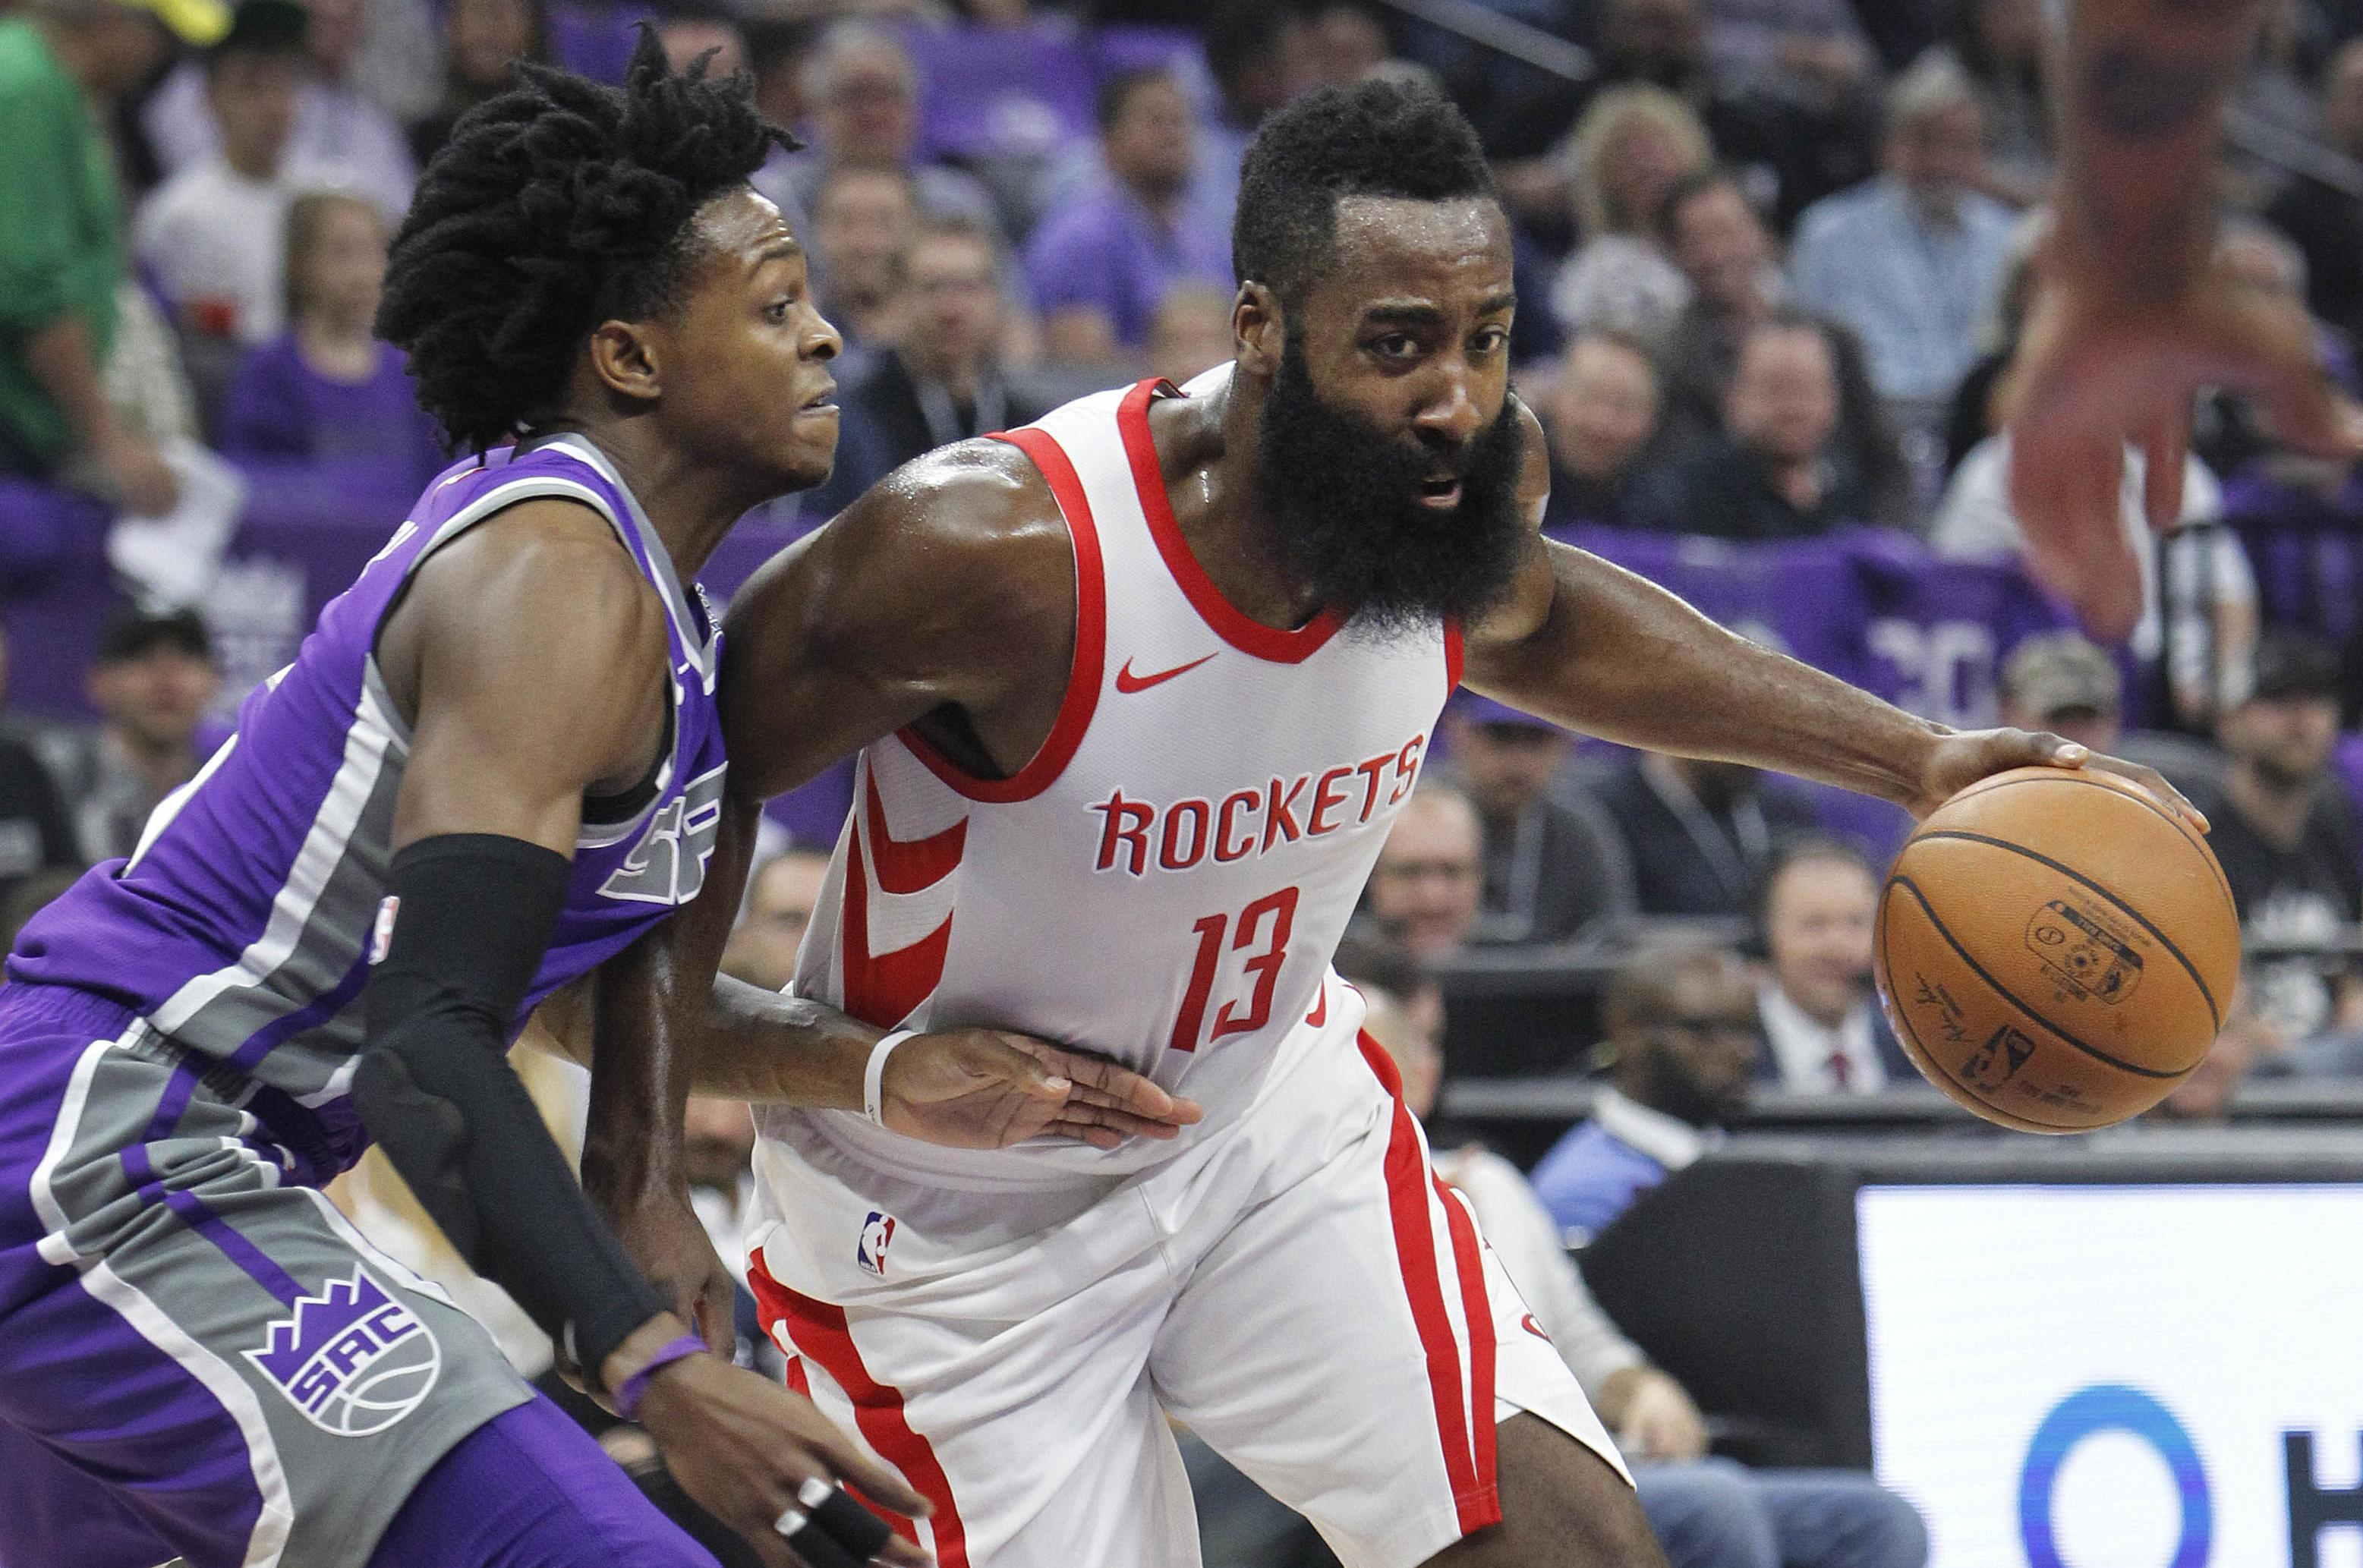 ad5f9ff49470 Houston Rockets guard James Harden (13) drives around Sacramento Kings  defender DeAaron Fox (